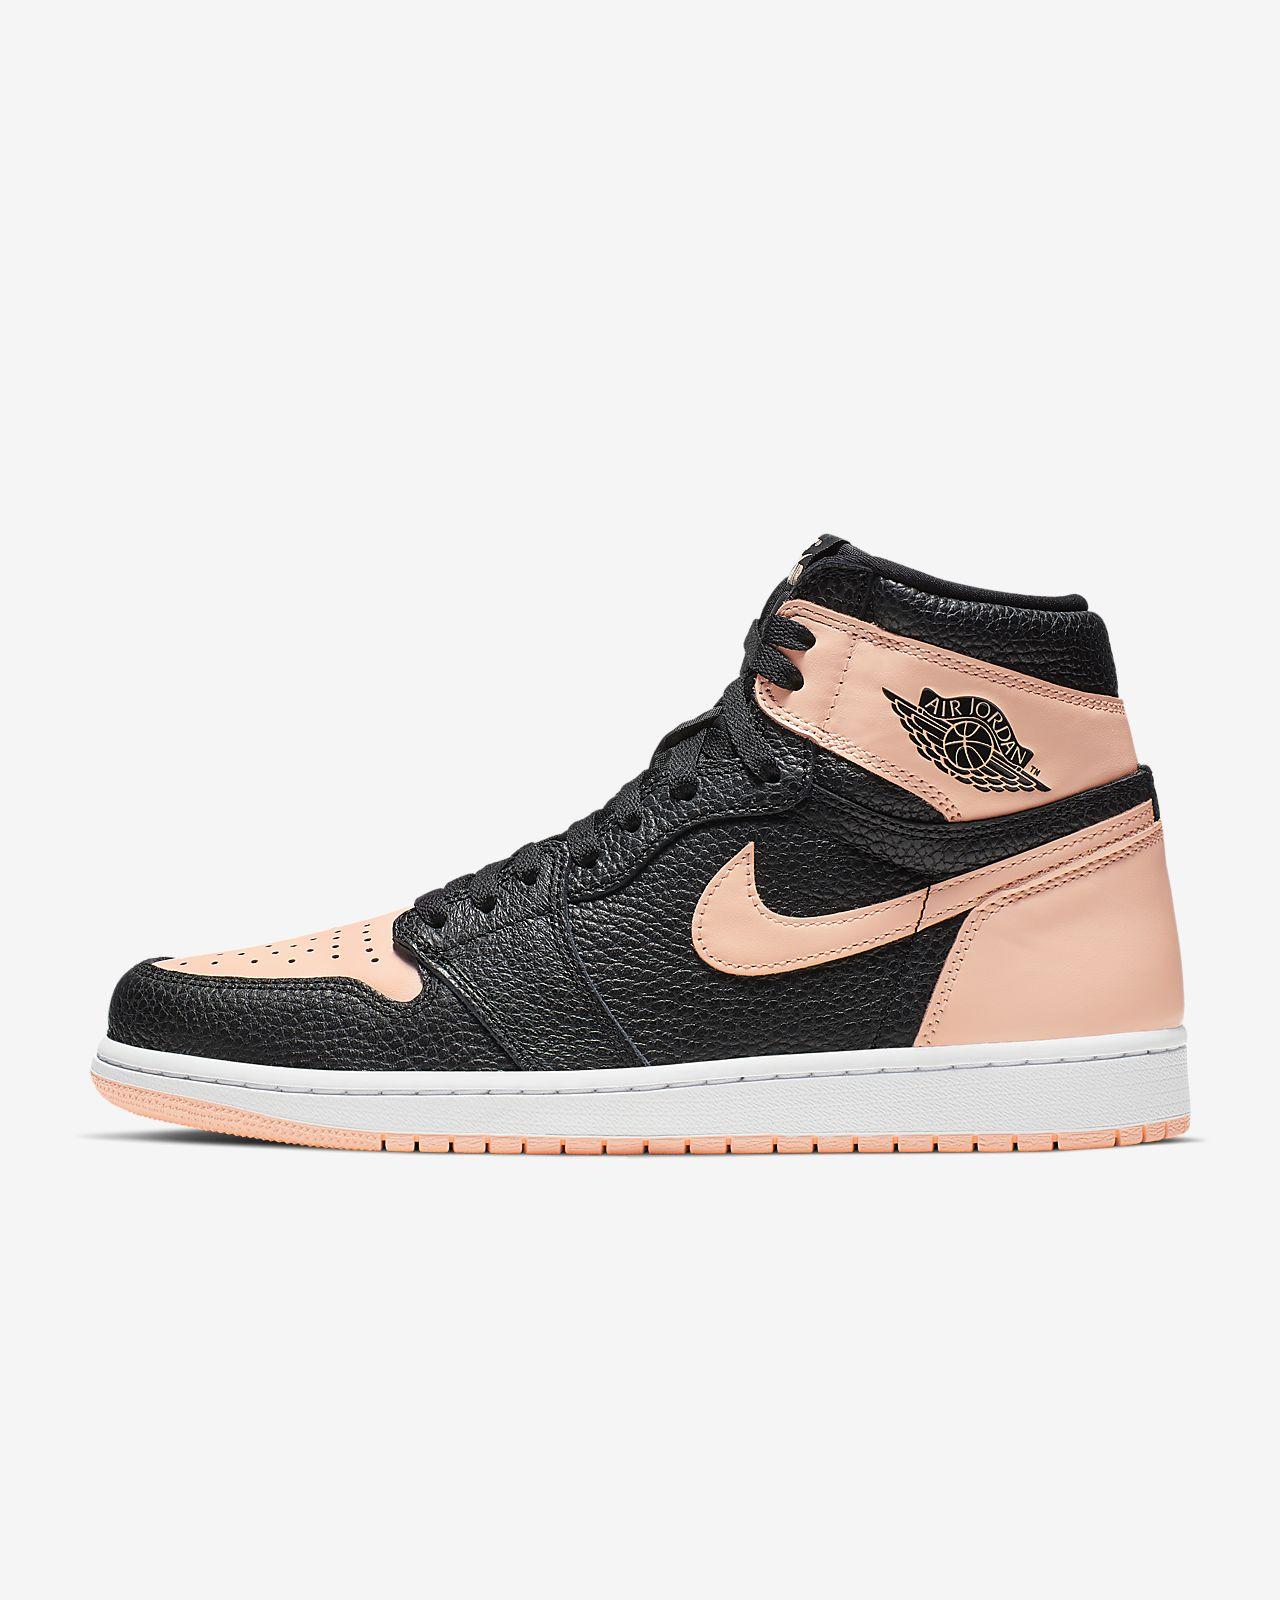 Air Jordan 1 Retro High OG 鞋款